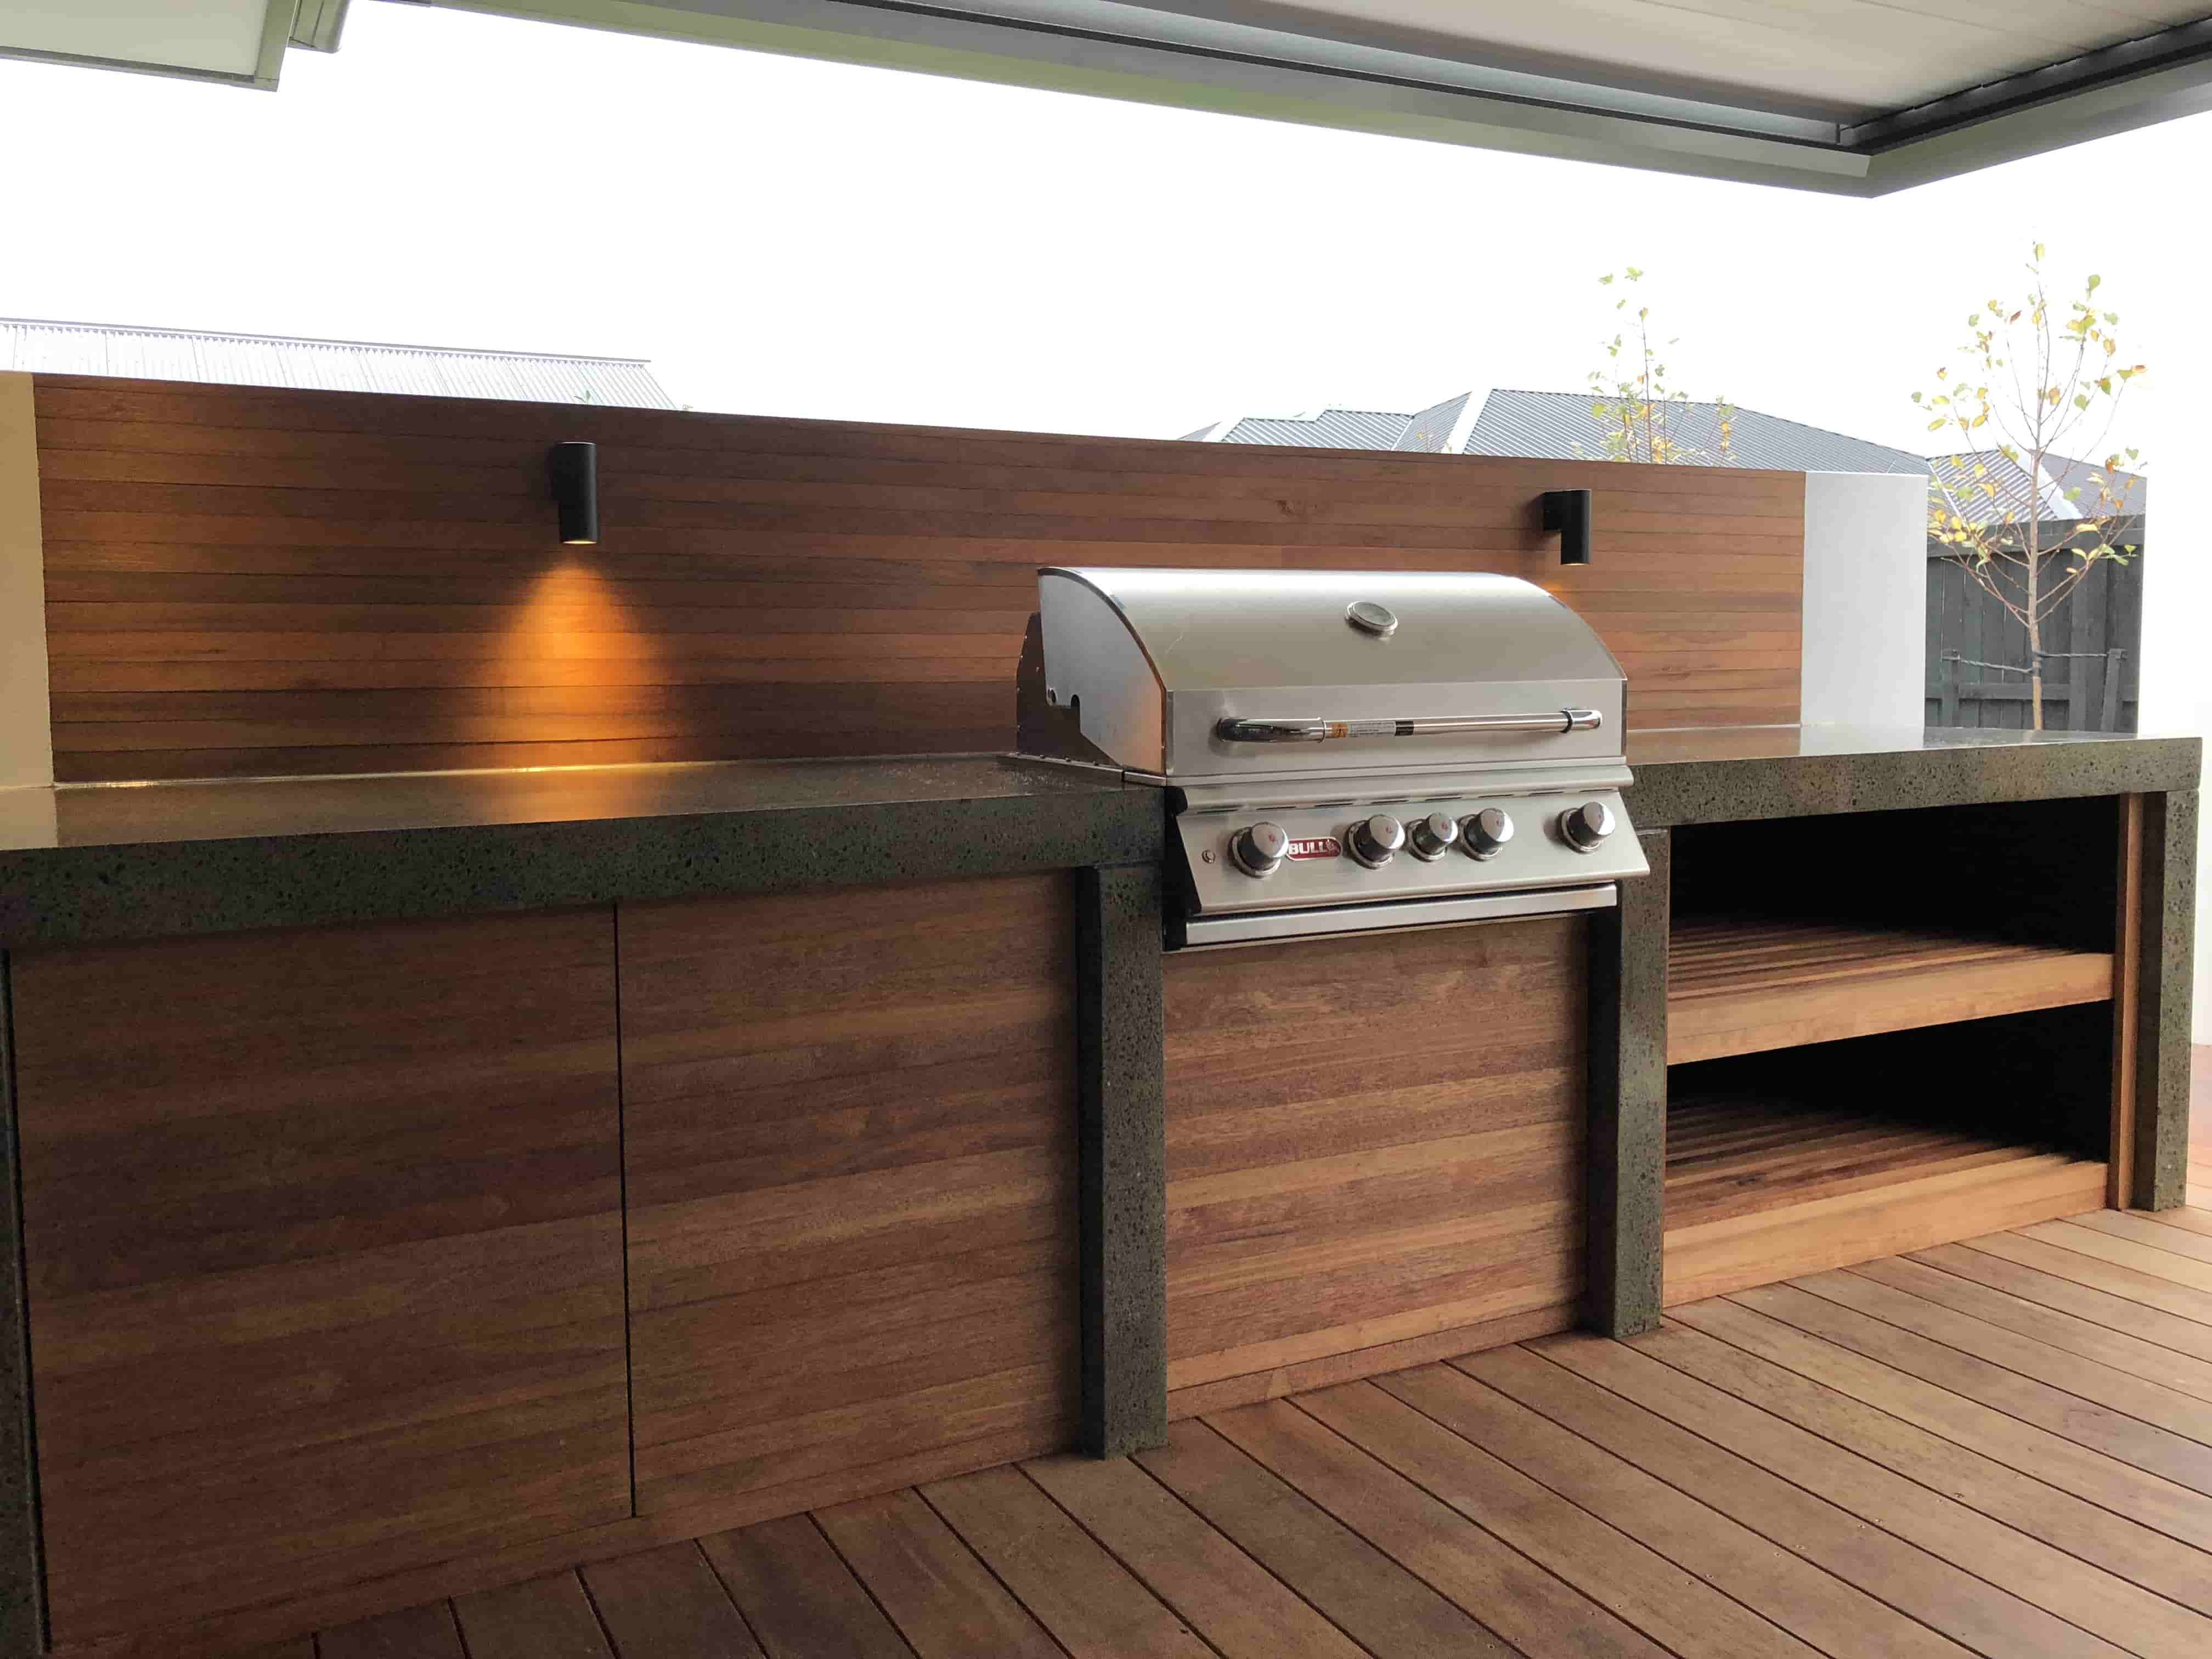 outdoor kitchen grills kitchens christchurch design construction dwg kit set